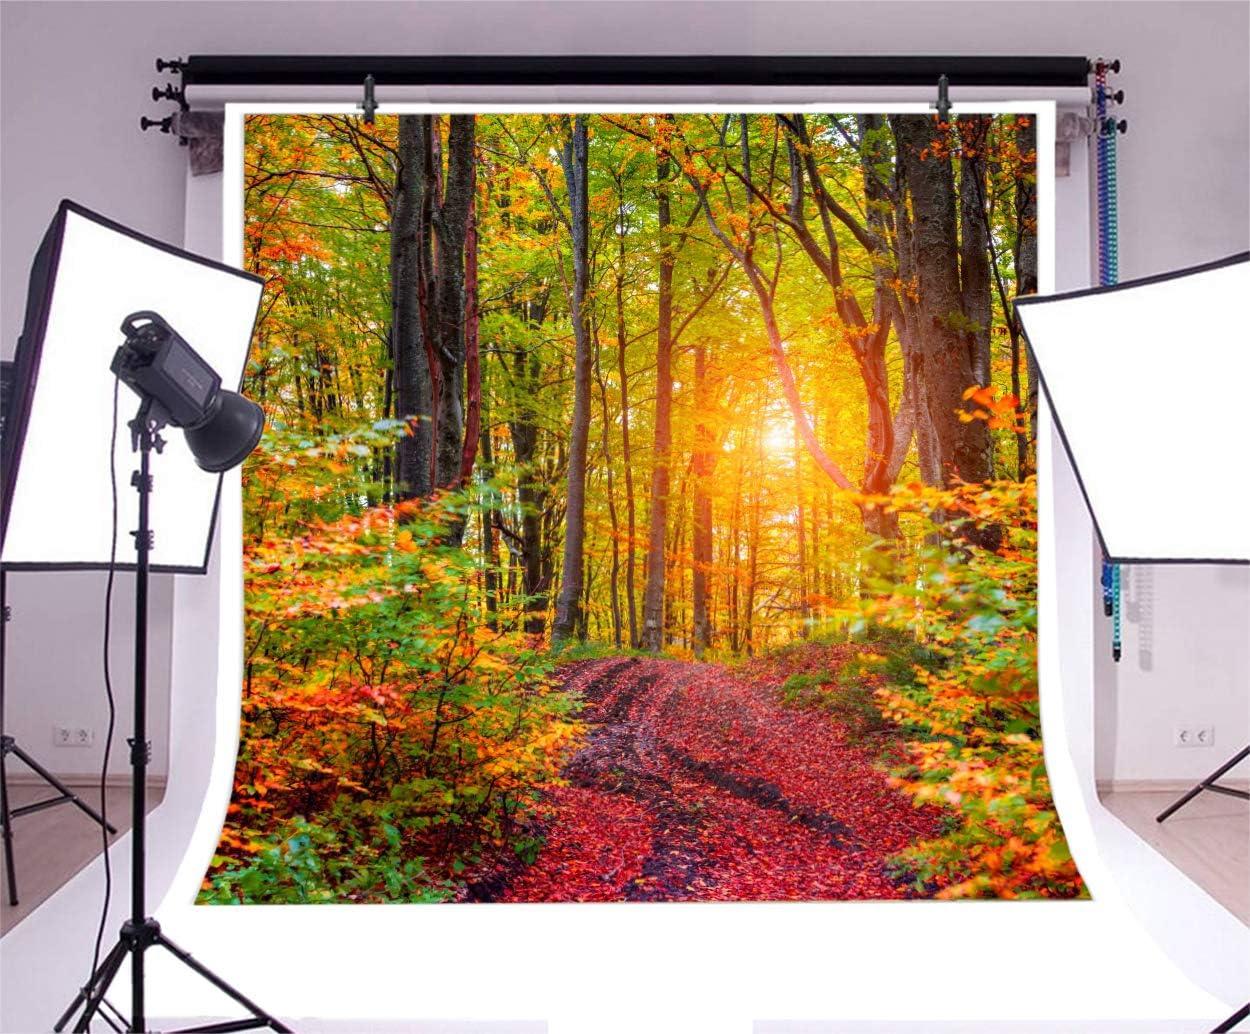 Baocicco Vinyl 10x10ft Autumn Landscape Backdrop Photograph Background Forest Outdoor Tourist Thanksgiving Festival Party Background Indoor Room Wallpaper Children Adult Portraits Photo Studio